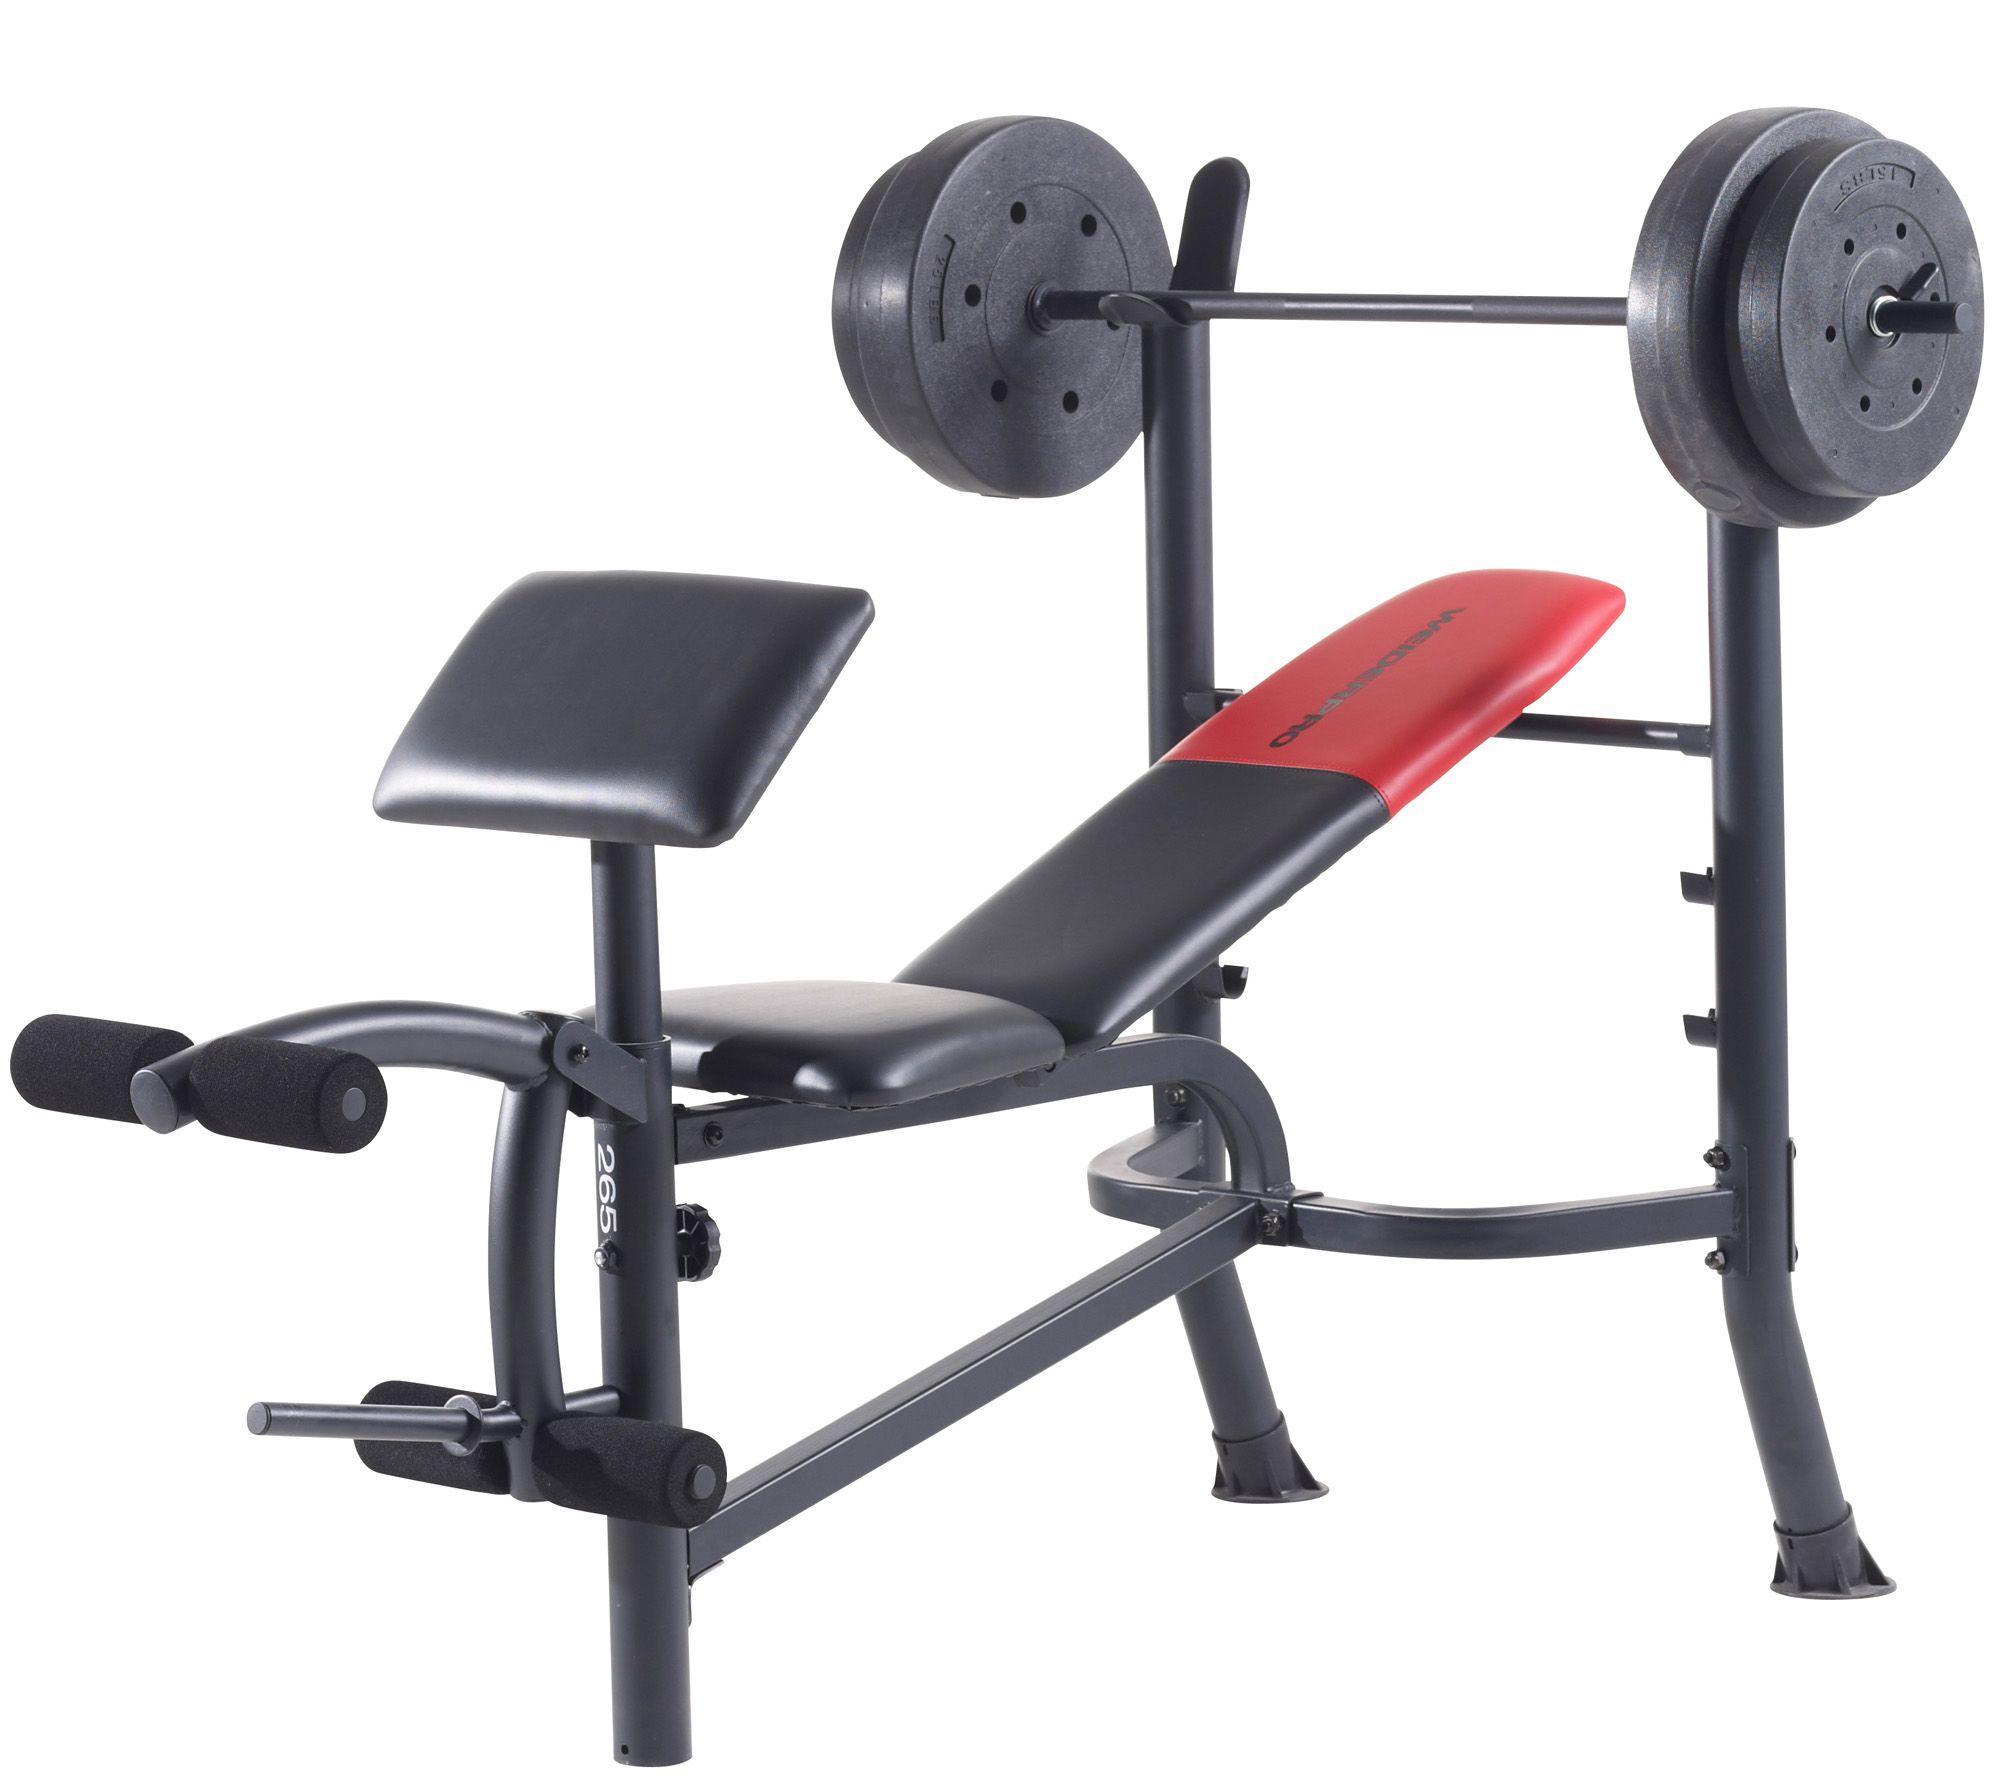 Weider Pro 265 Standard Bench Bar And Weightset Qvc Com